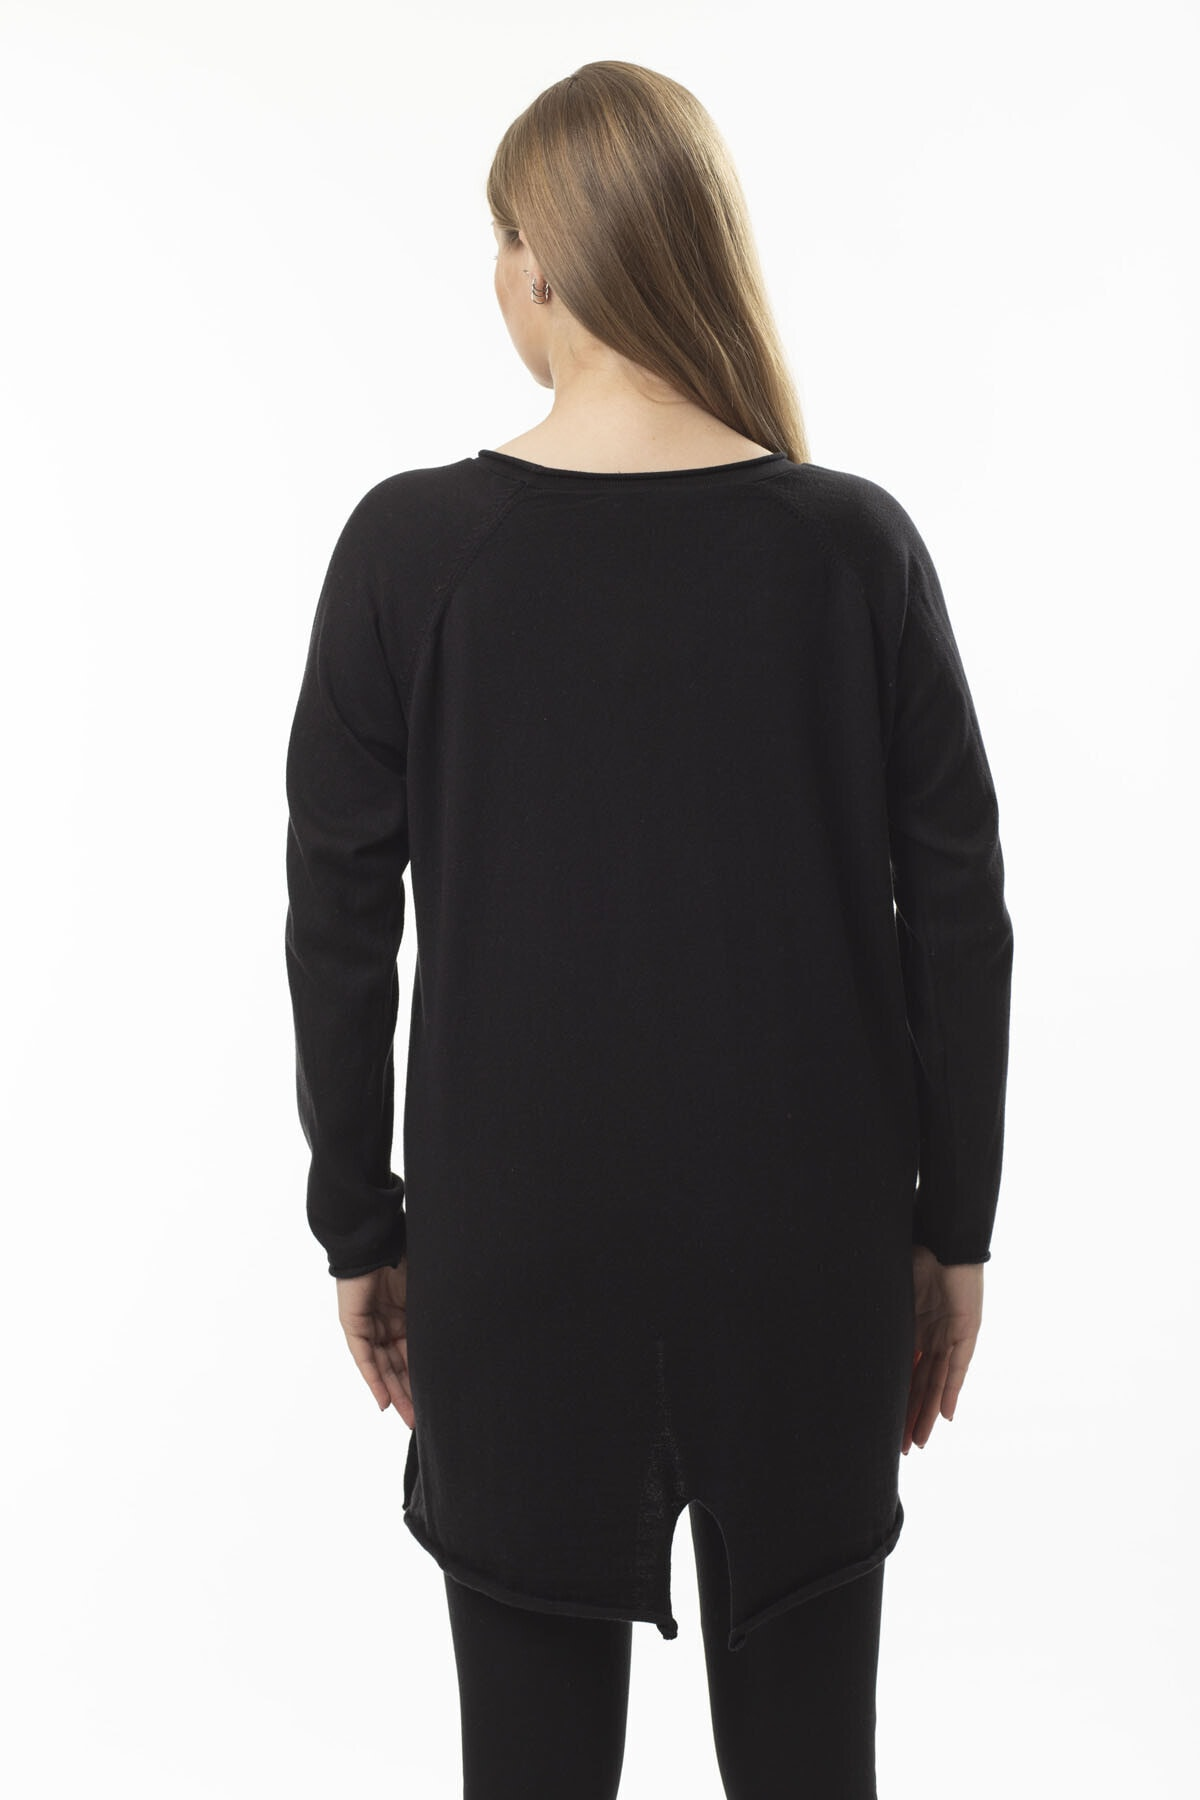 STAMINA Bs01401-büyük Beden Tunik-siyah 2